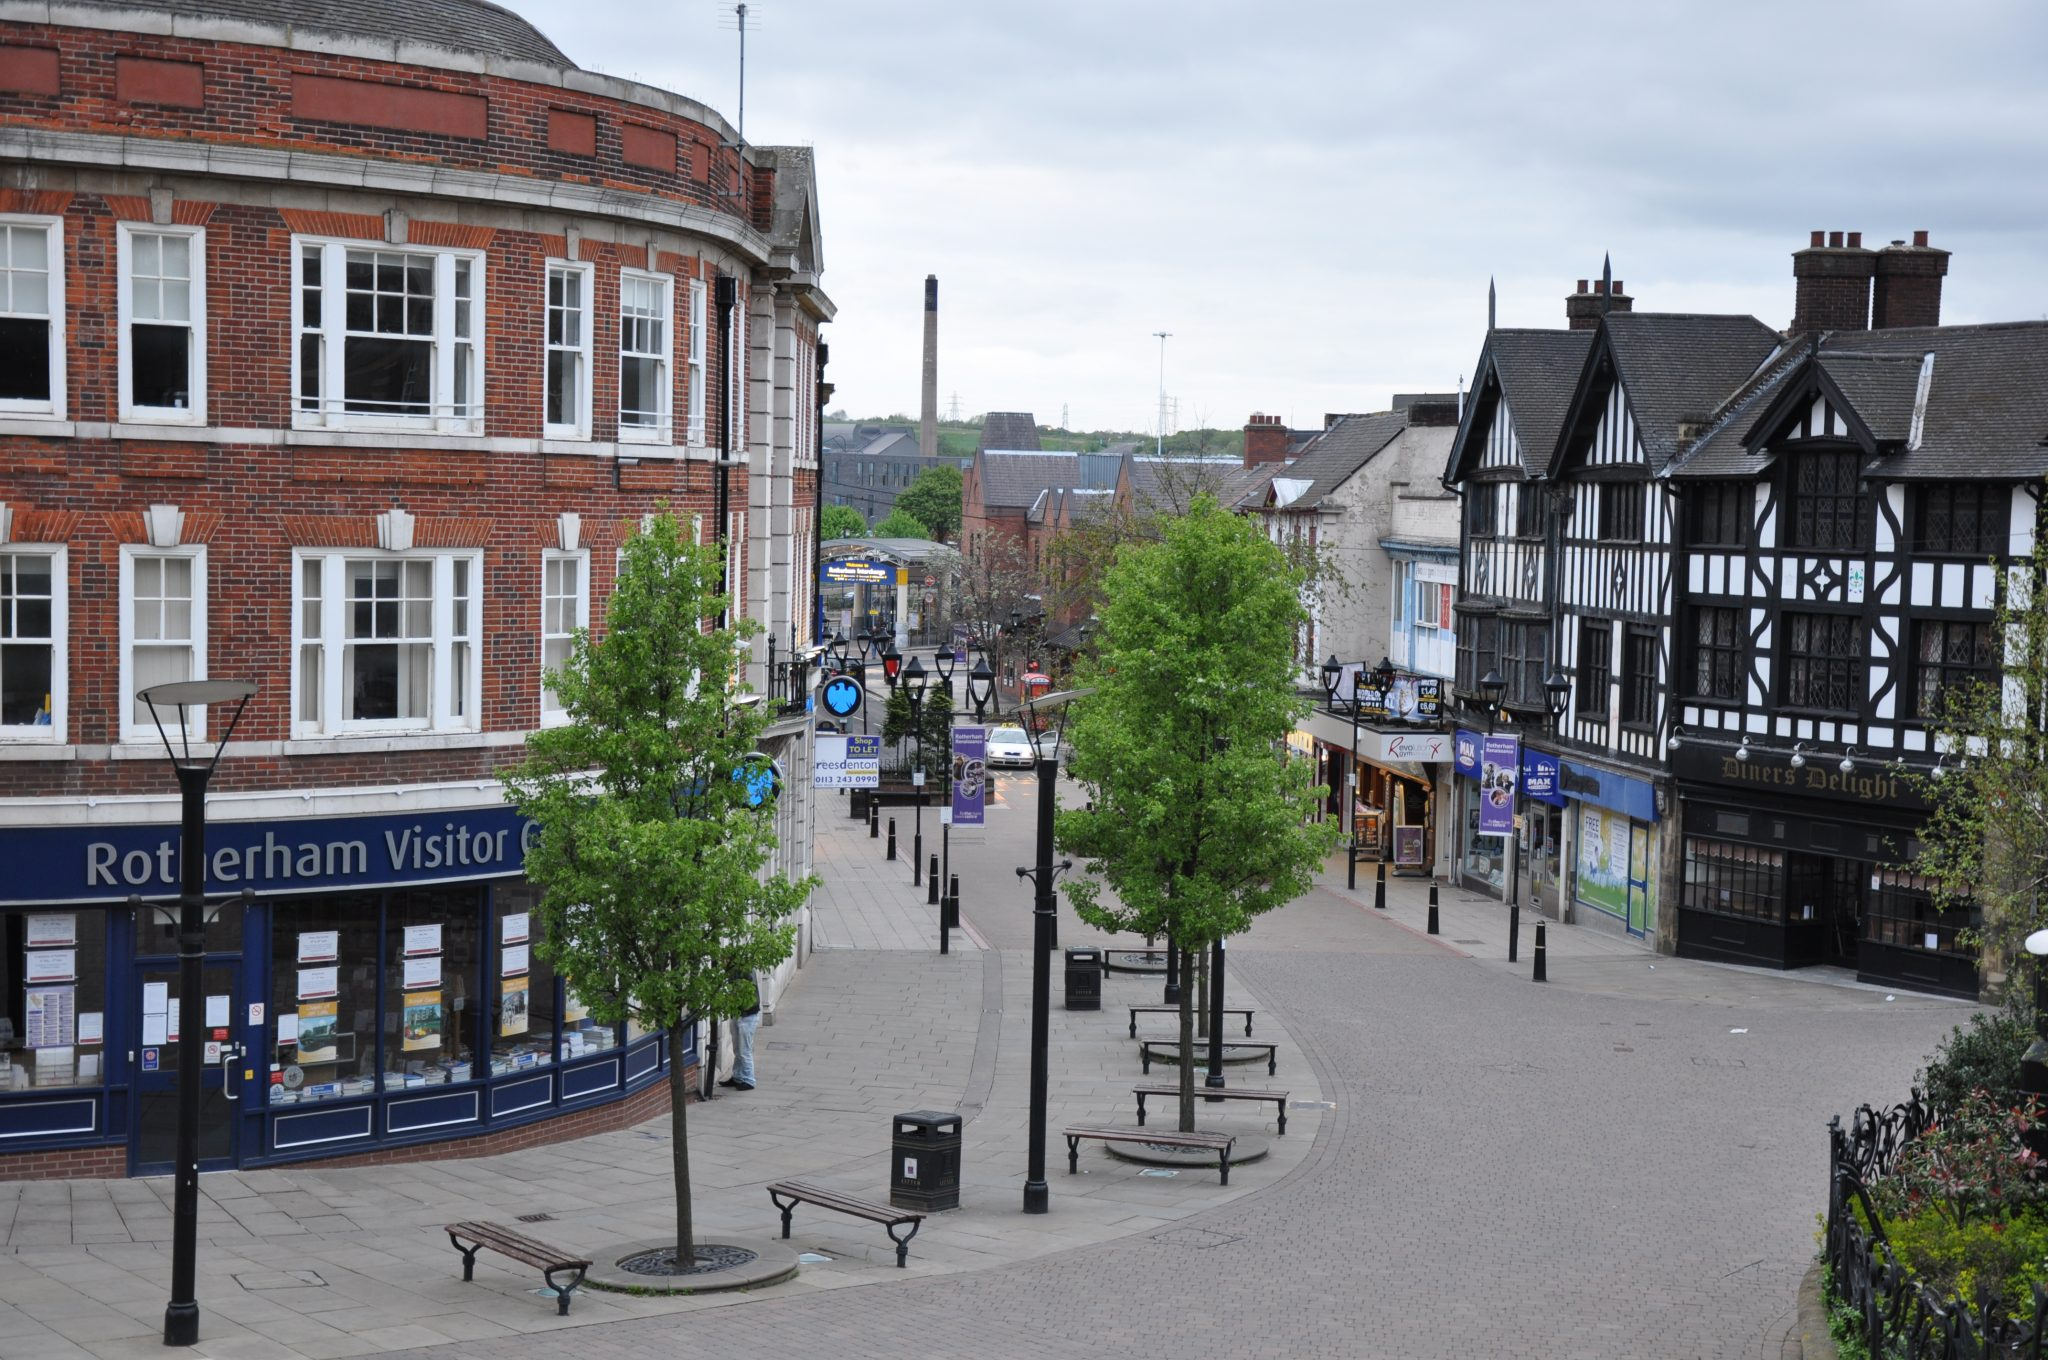 CCTV Services Rotherham